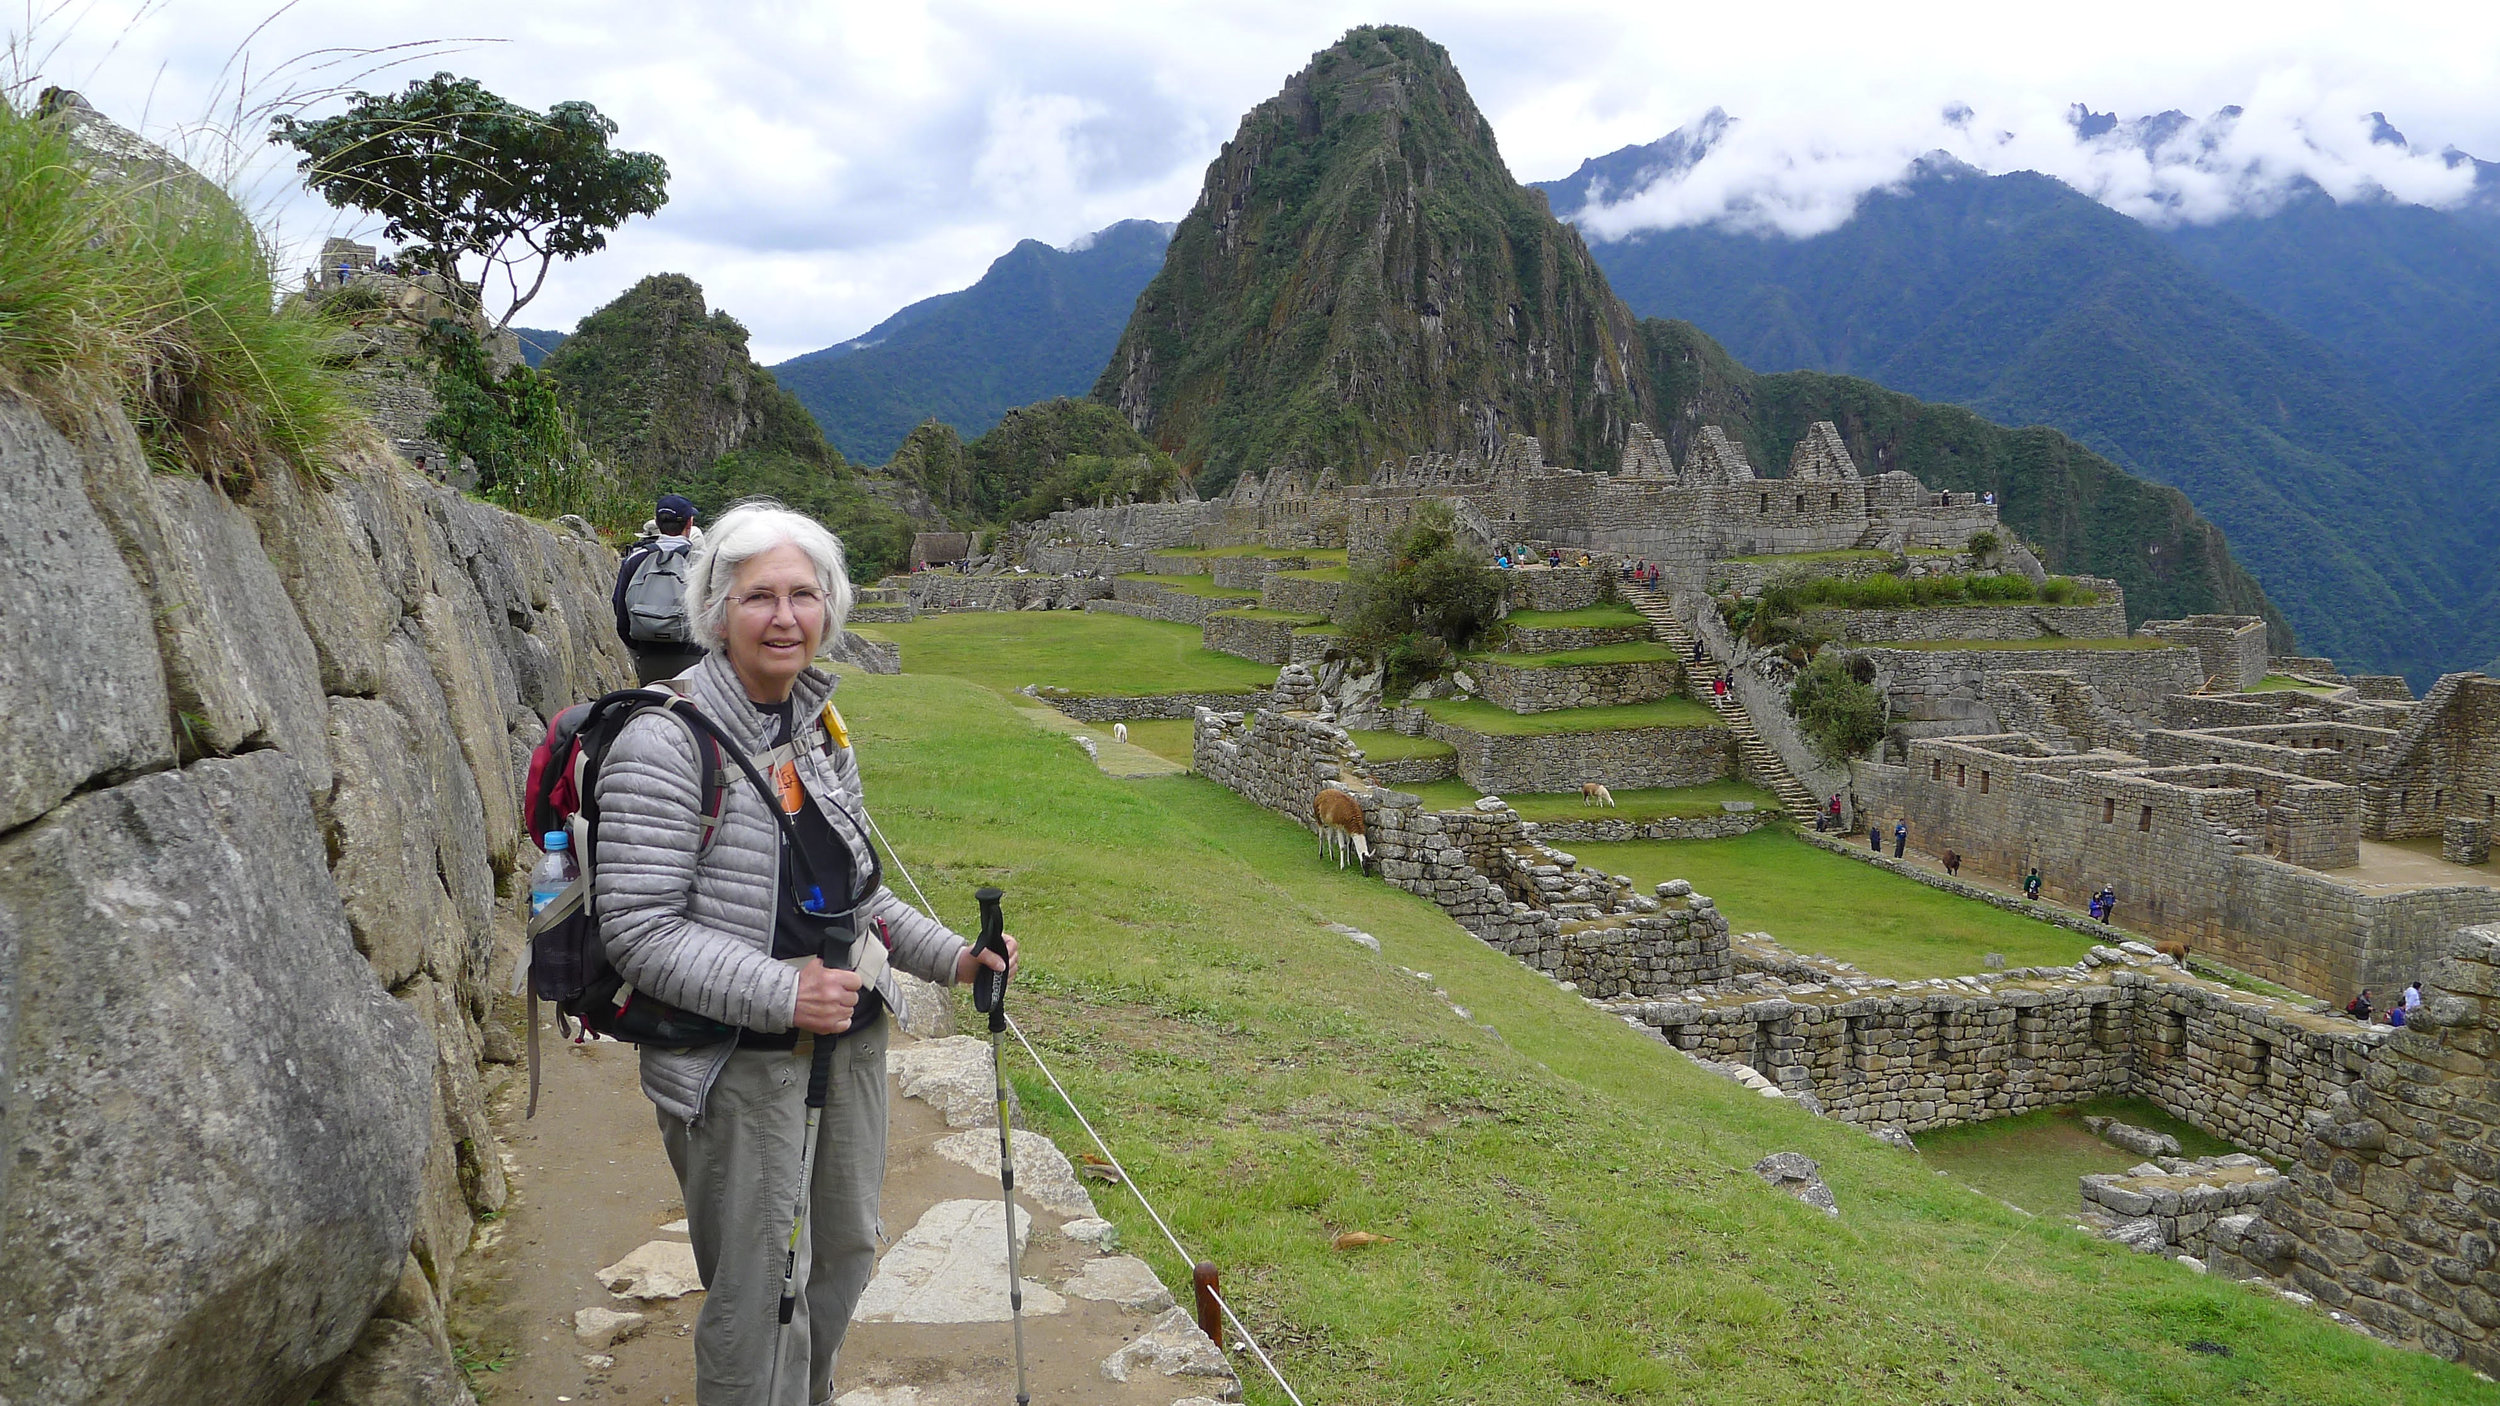 Heading Into Machu Picchu